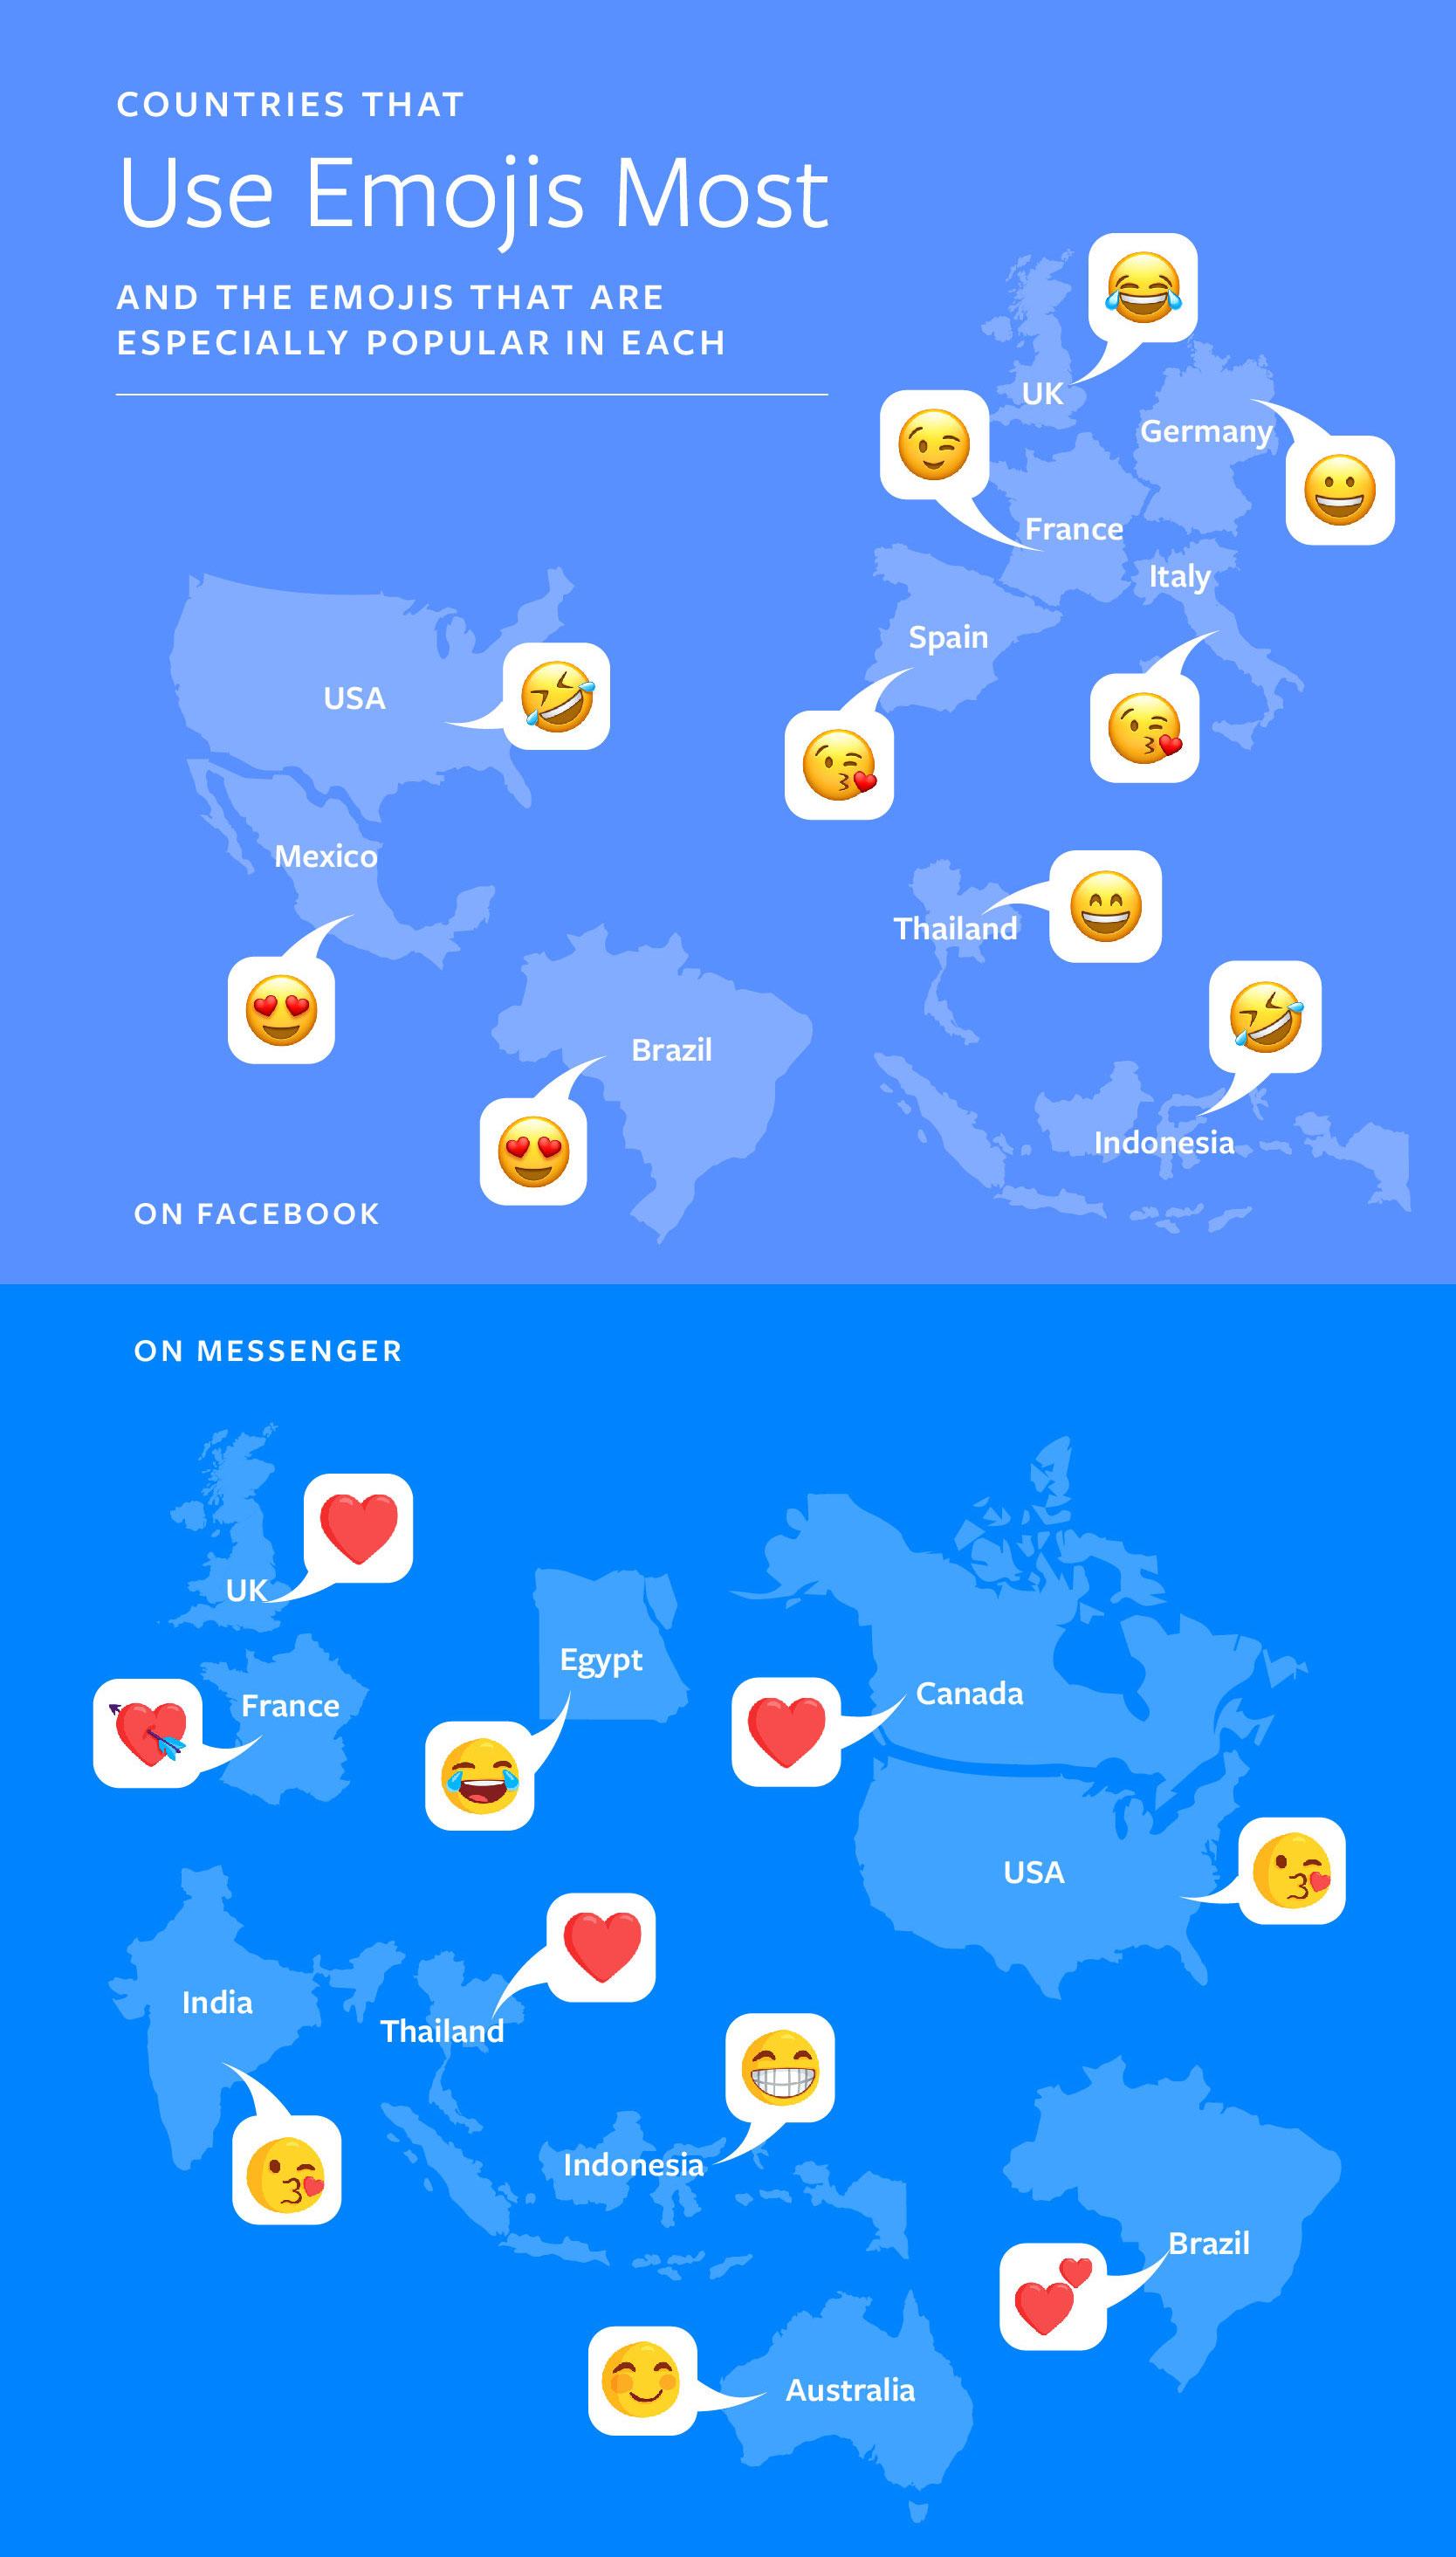 5 billion emojis sent daily on messenger